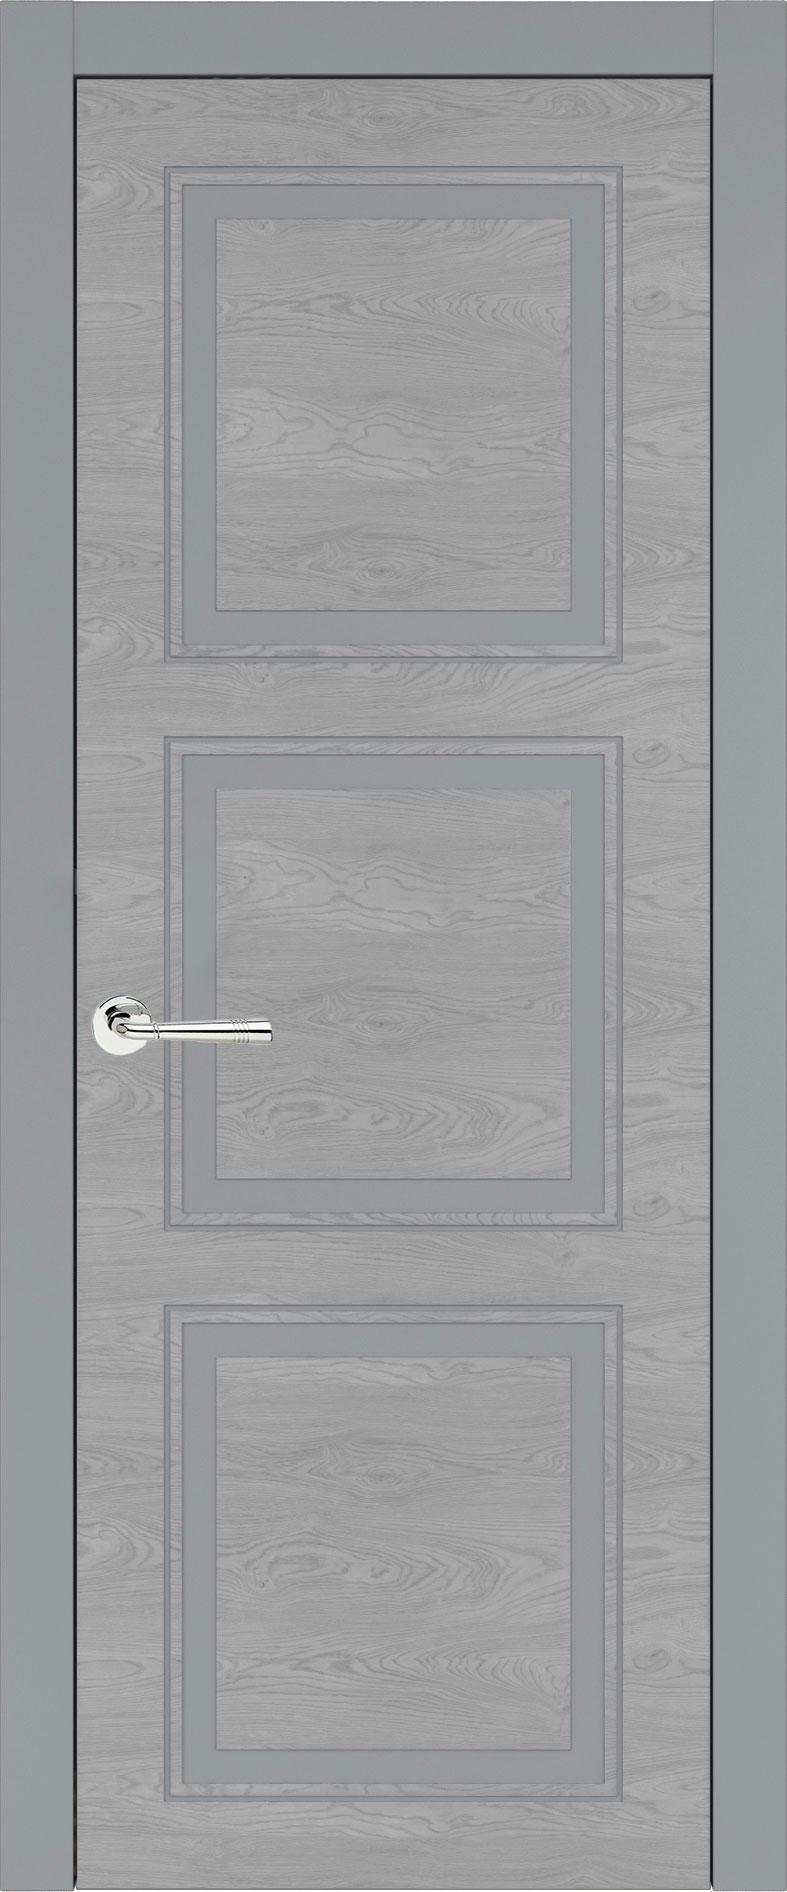 Milano Neo Classic цвет - Серебристо-серая эмаль по шпону (RAL 7045) Без стекла (ДГ)